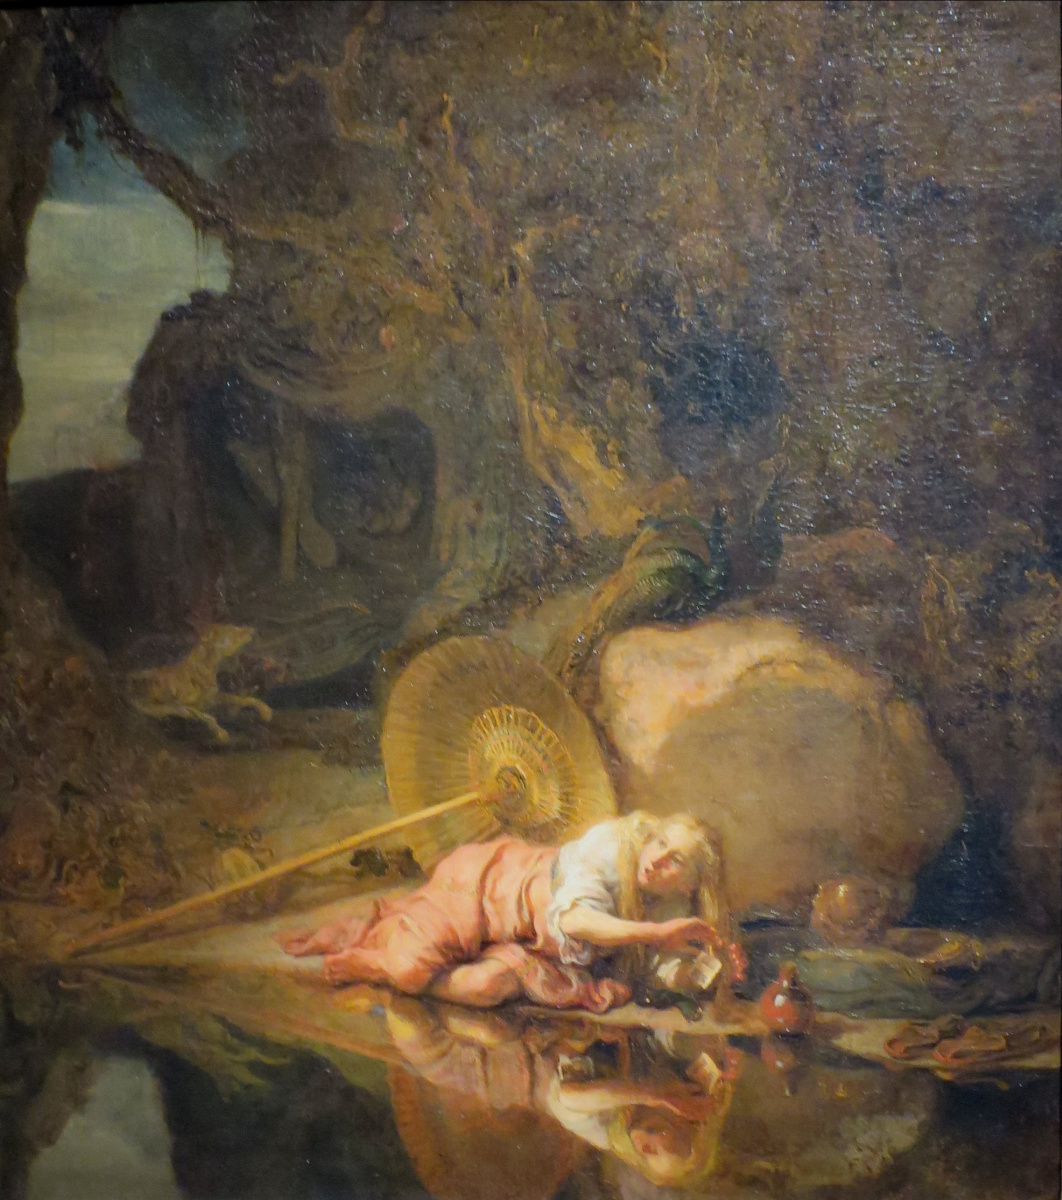 Karel Fabricius. Hera taking refuge during a battle between gods and giants